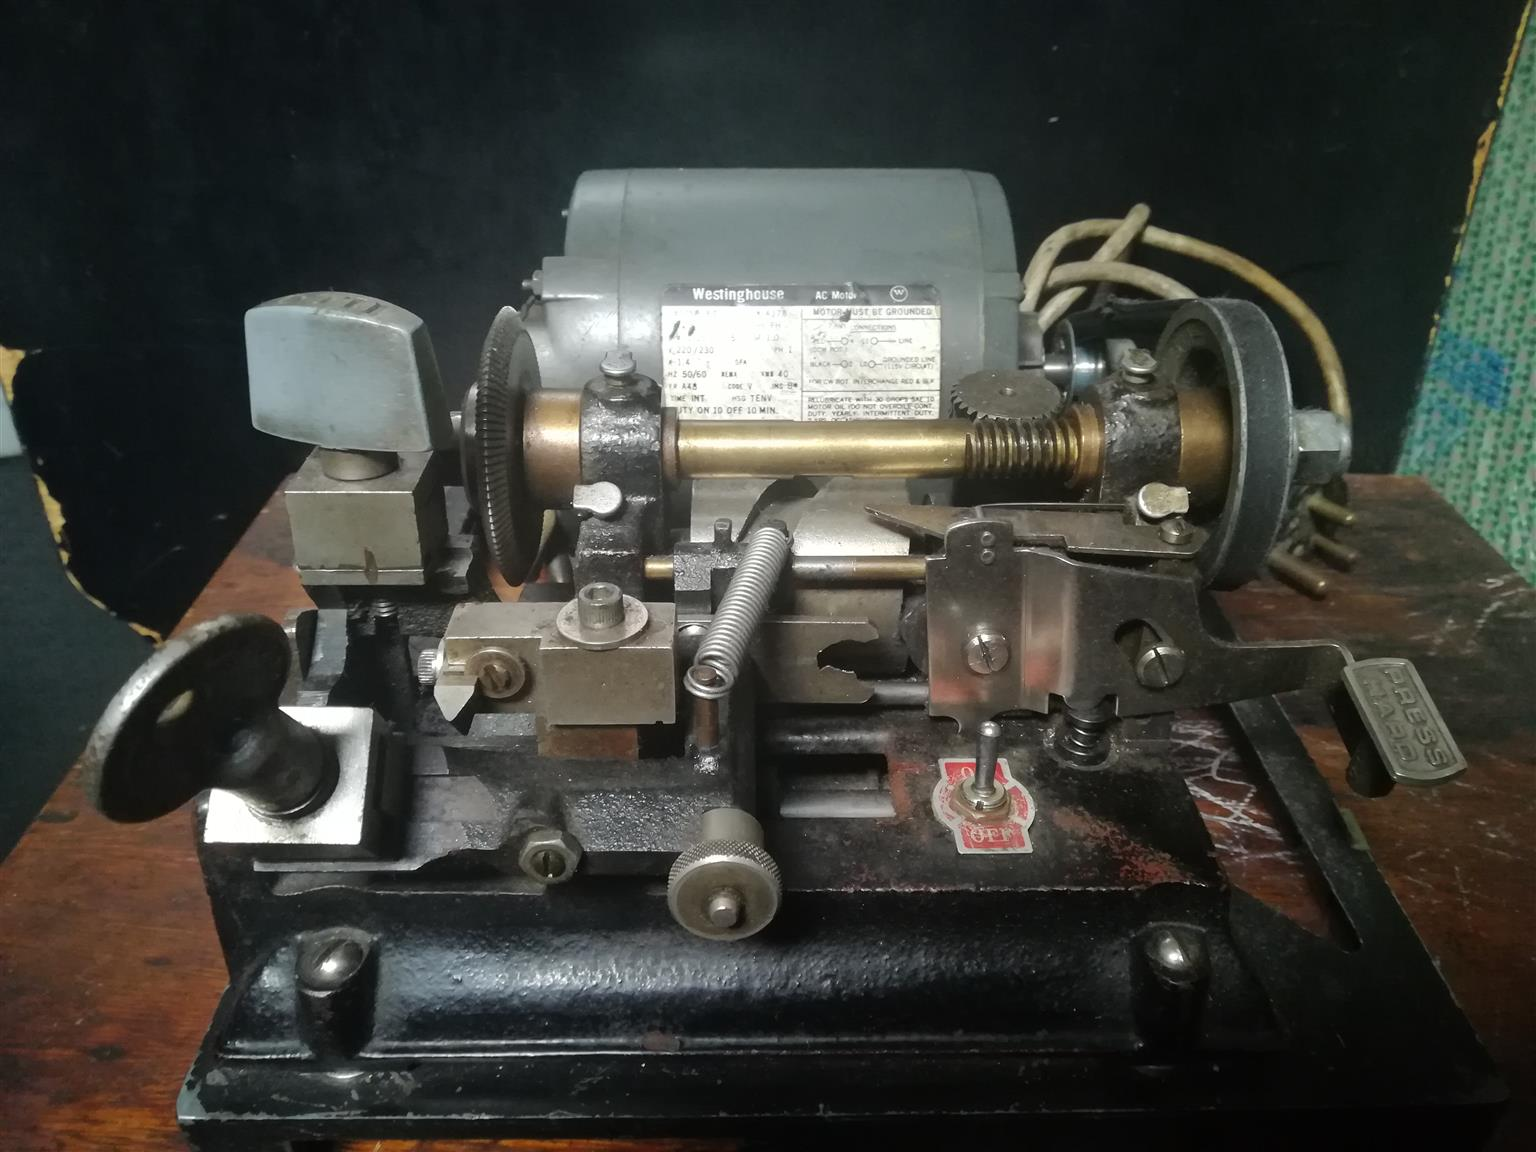 Key cutting machine + blanks